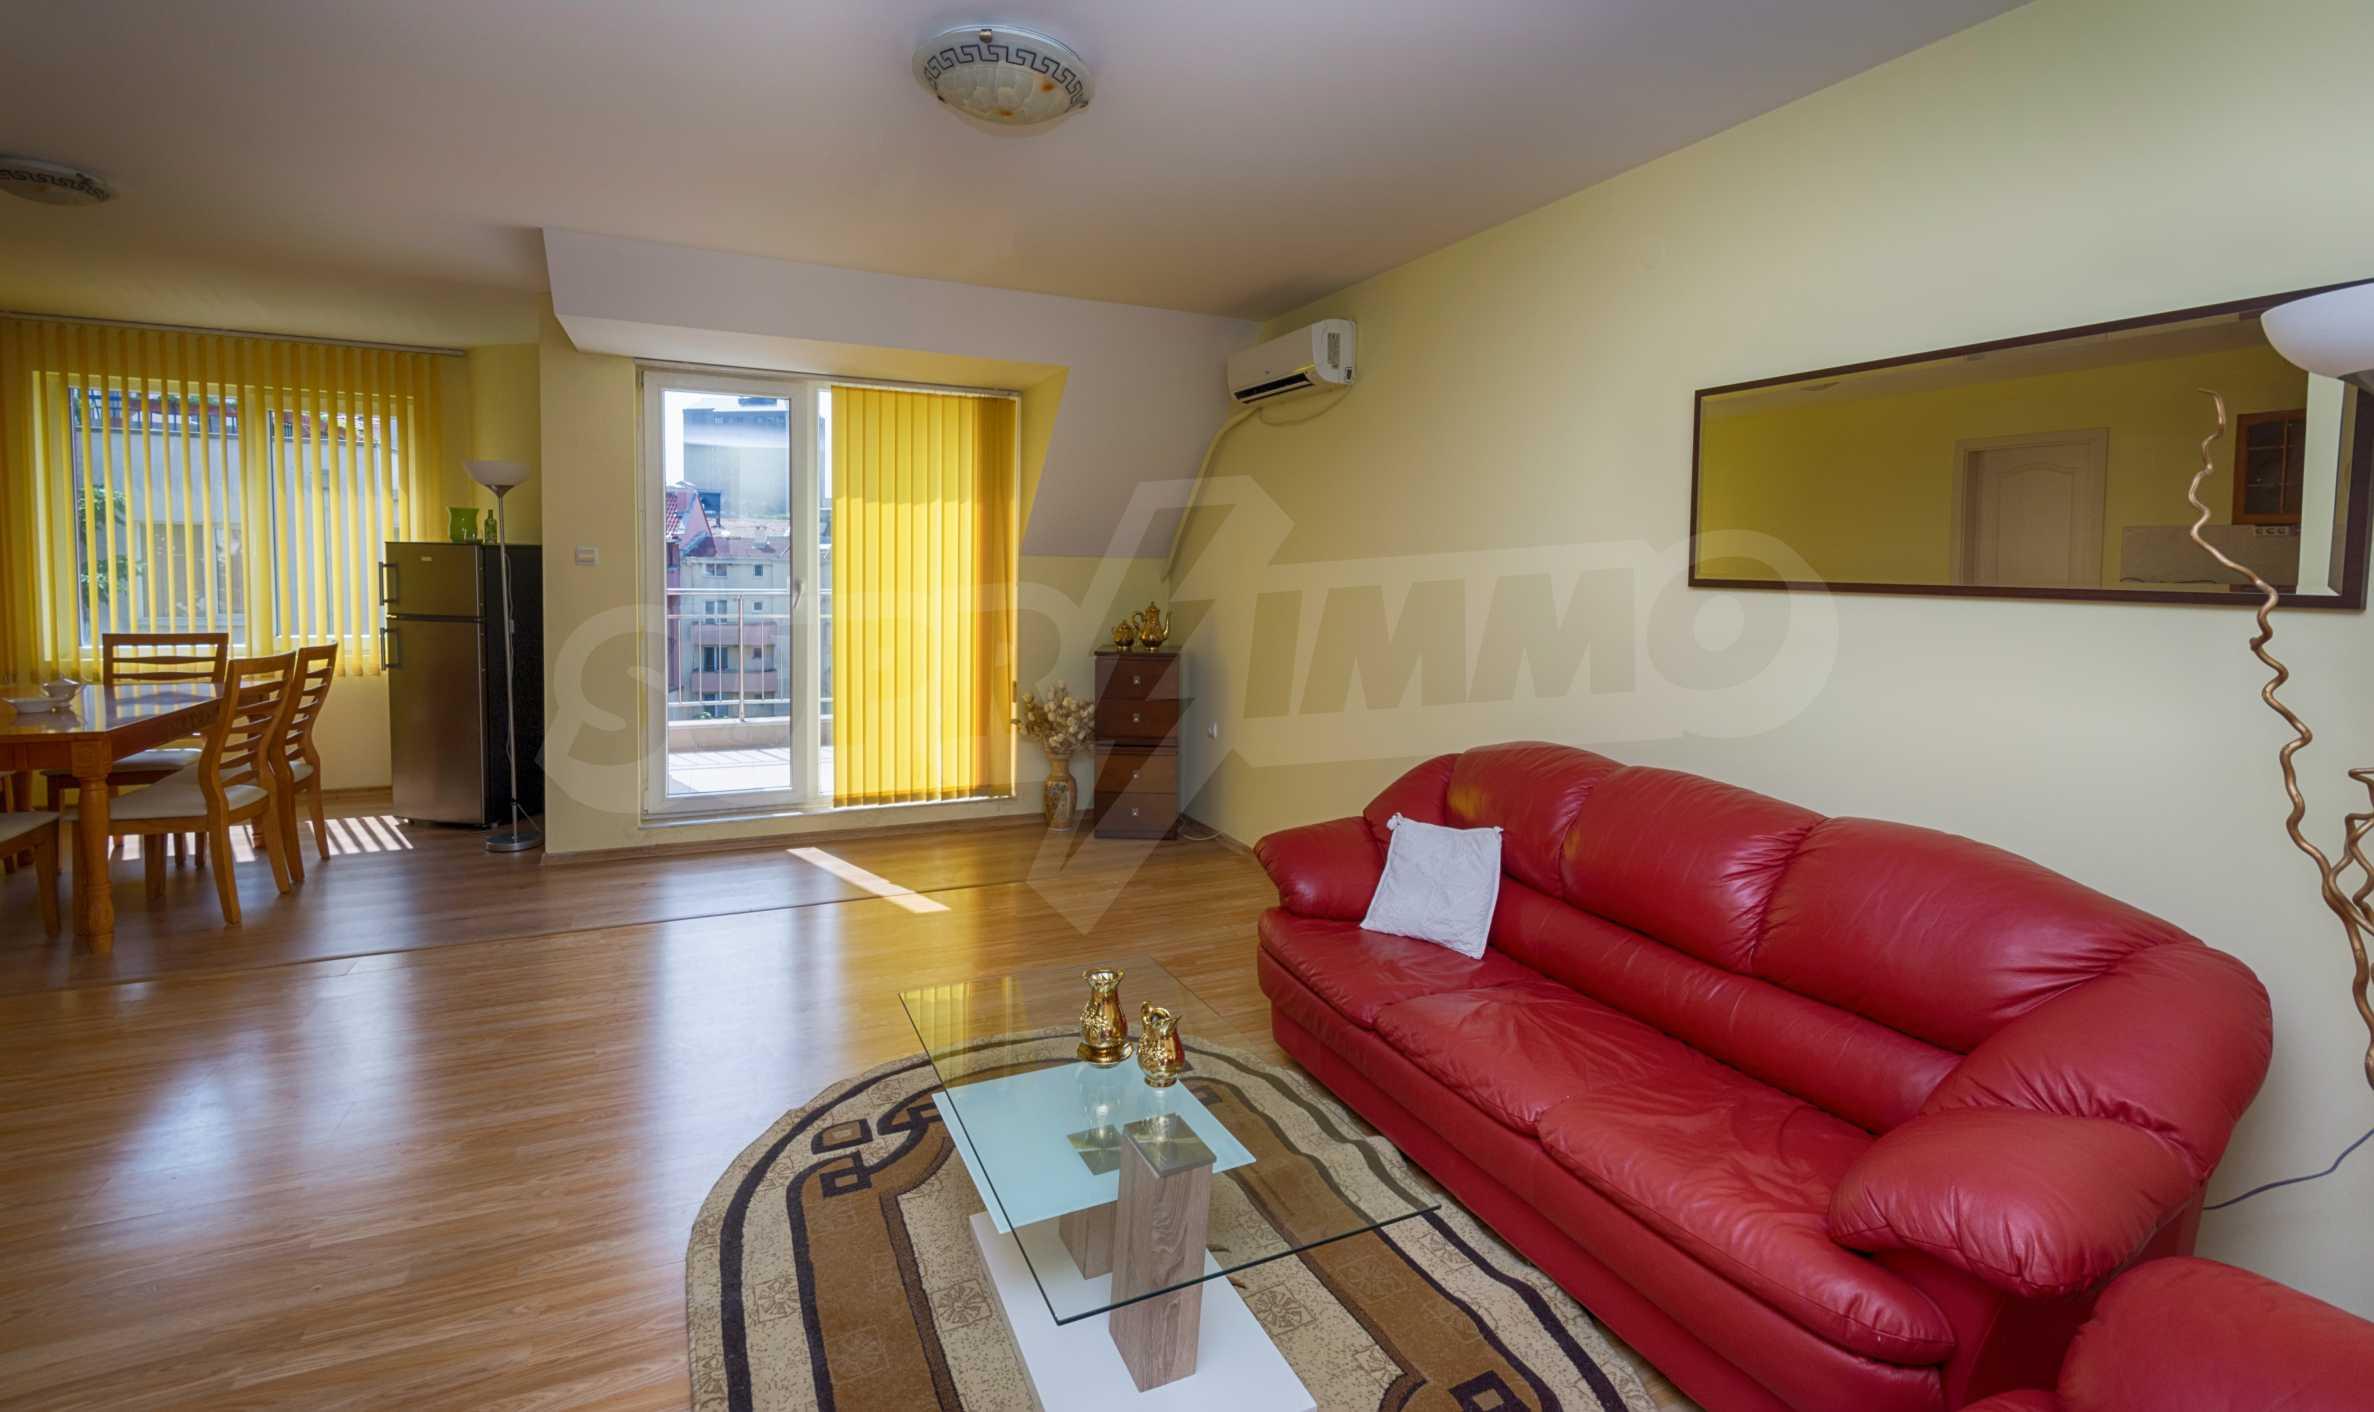 Многостаен апартамент до Гранд Хотел Пловдив